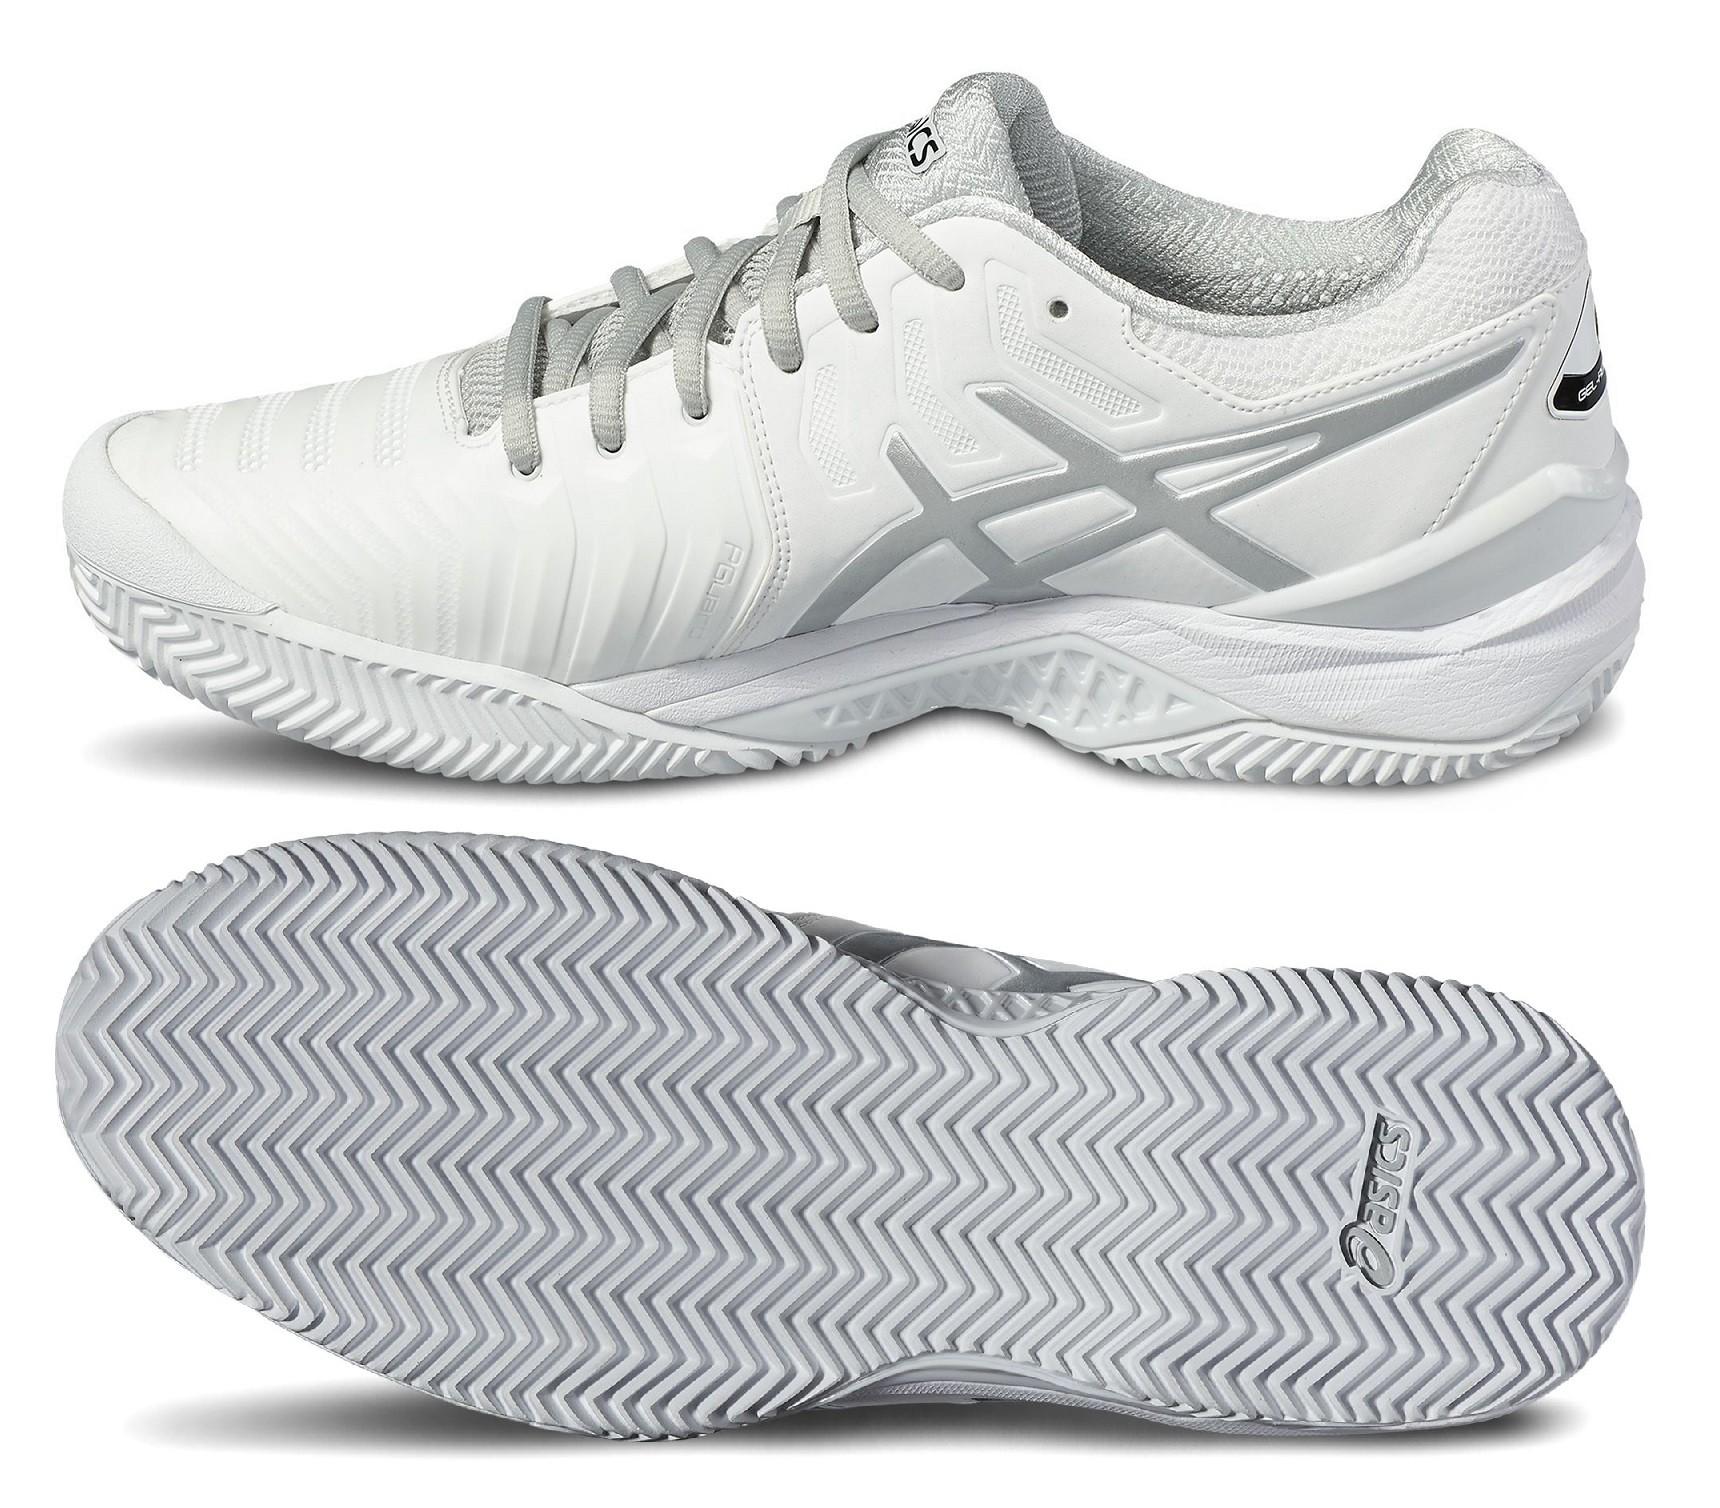 22cea4fdff6 Tenisová obuv Asics Gel Resolution 7 Clay E702Y-0193 bílá